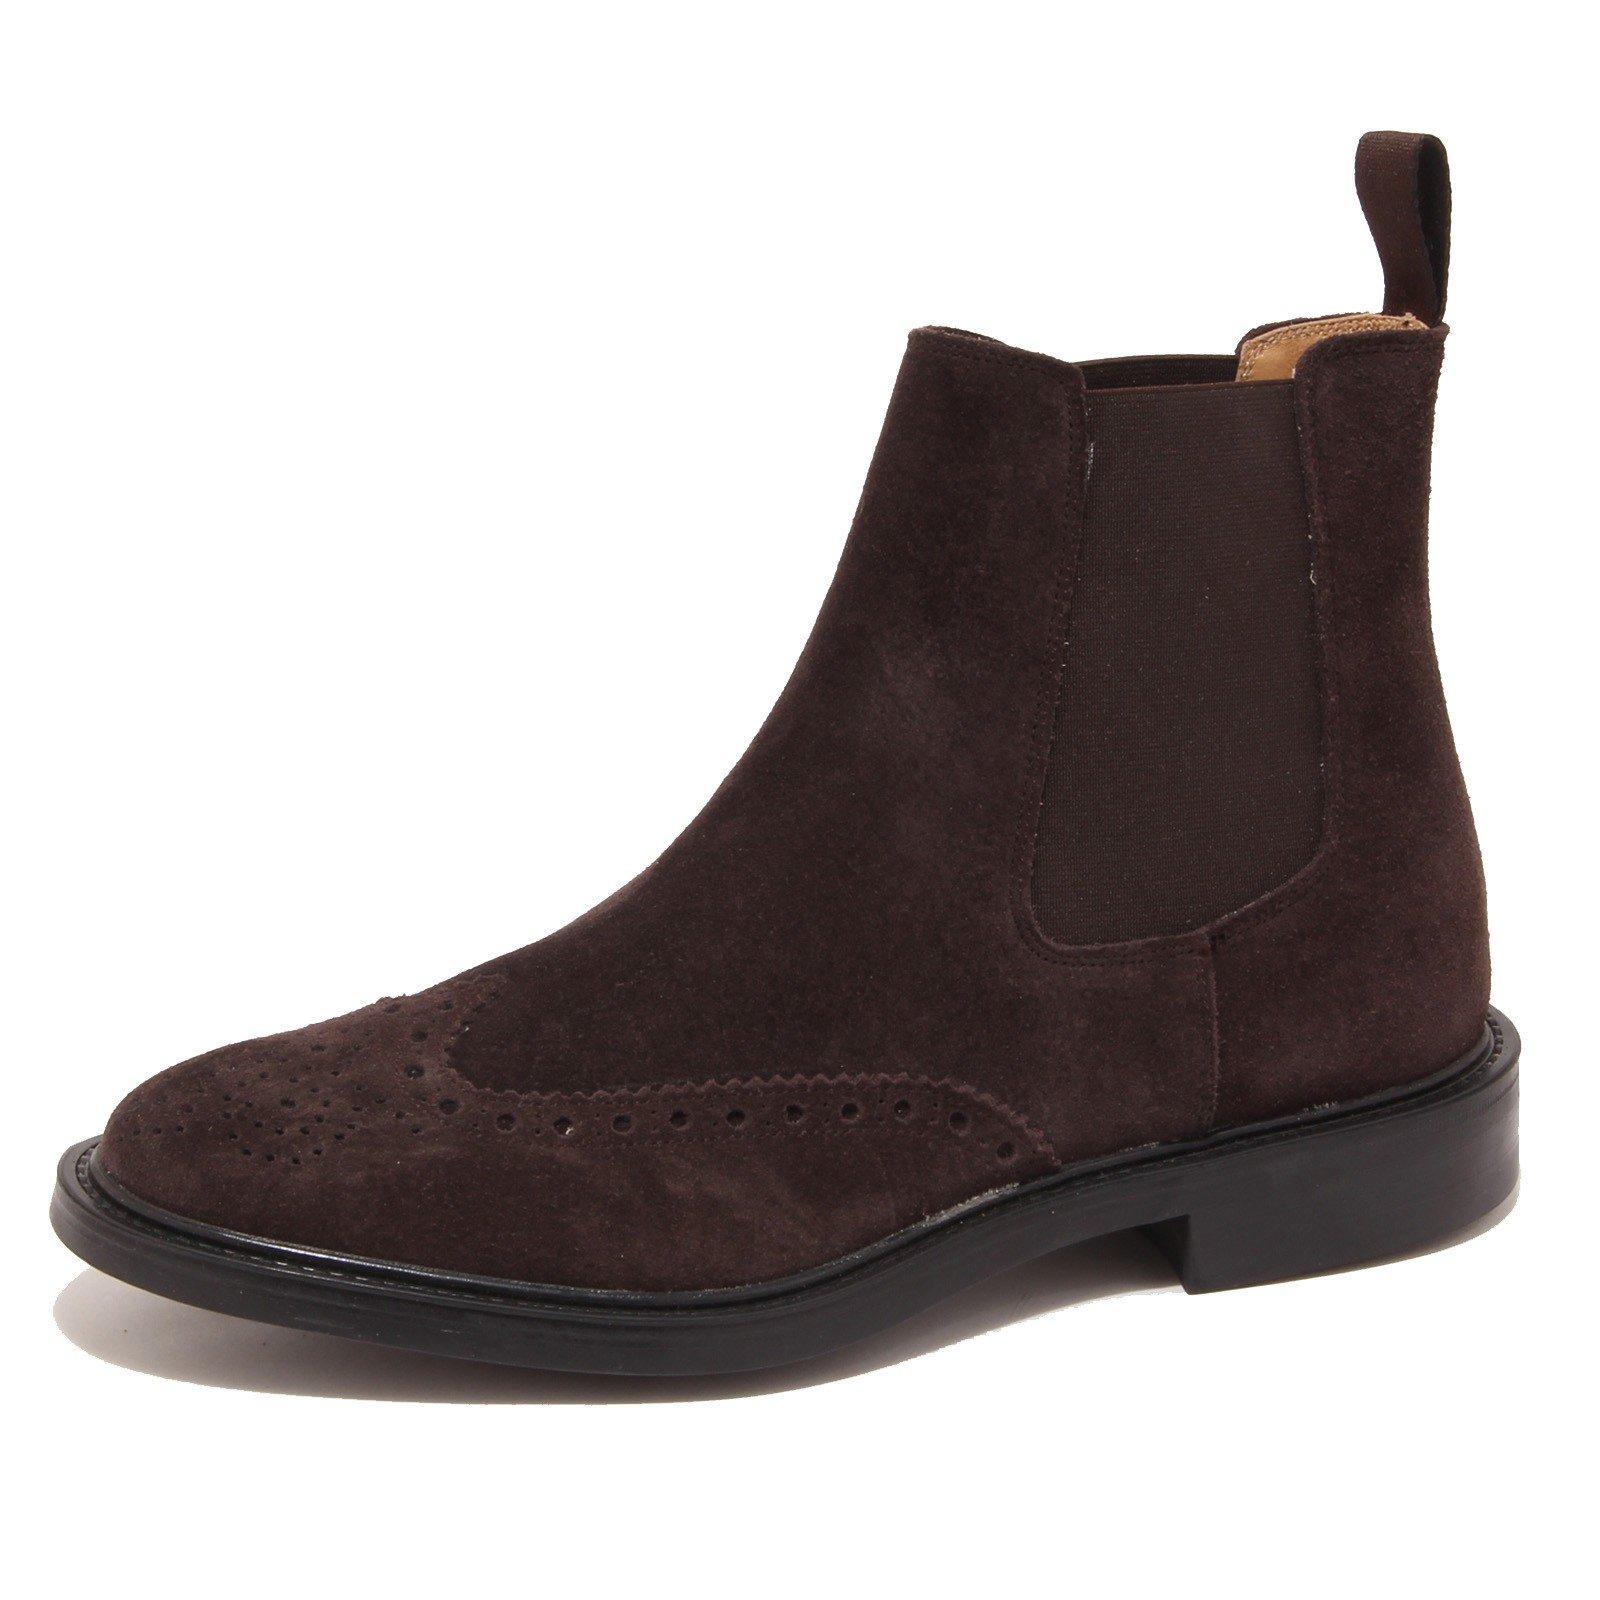 Saxone of Scotland Men's Suede Chelsea Boot Brown 2321_Dark - EU40.5/US7.5